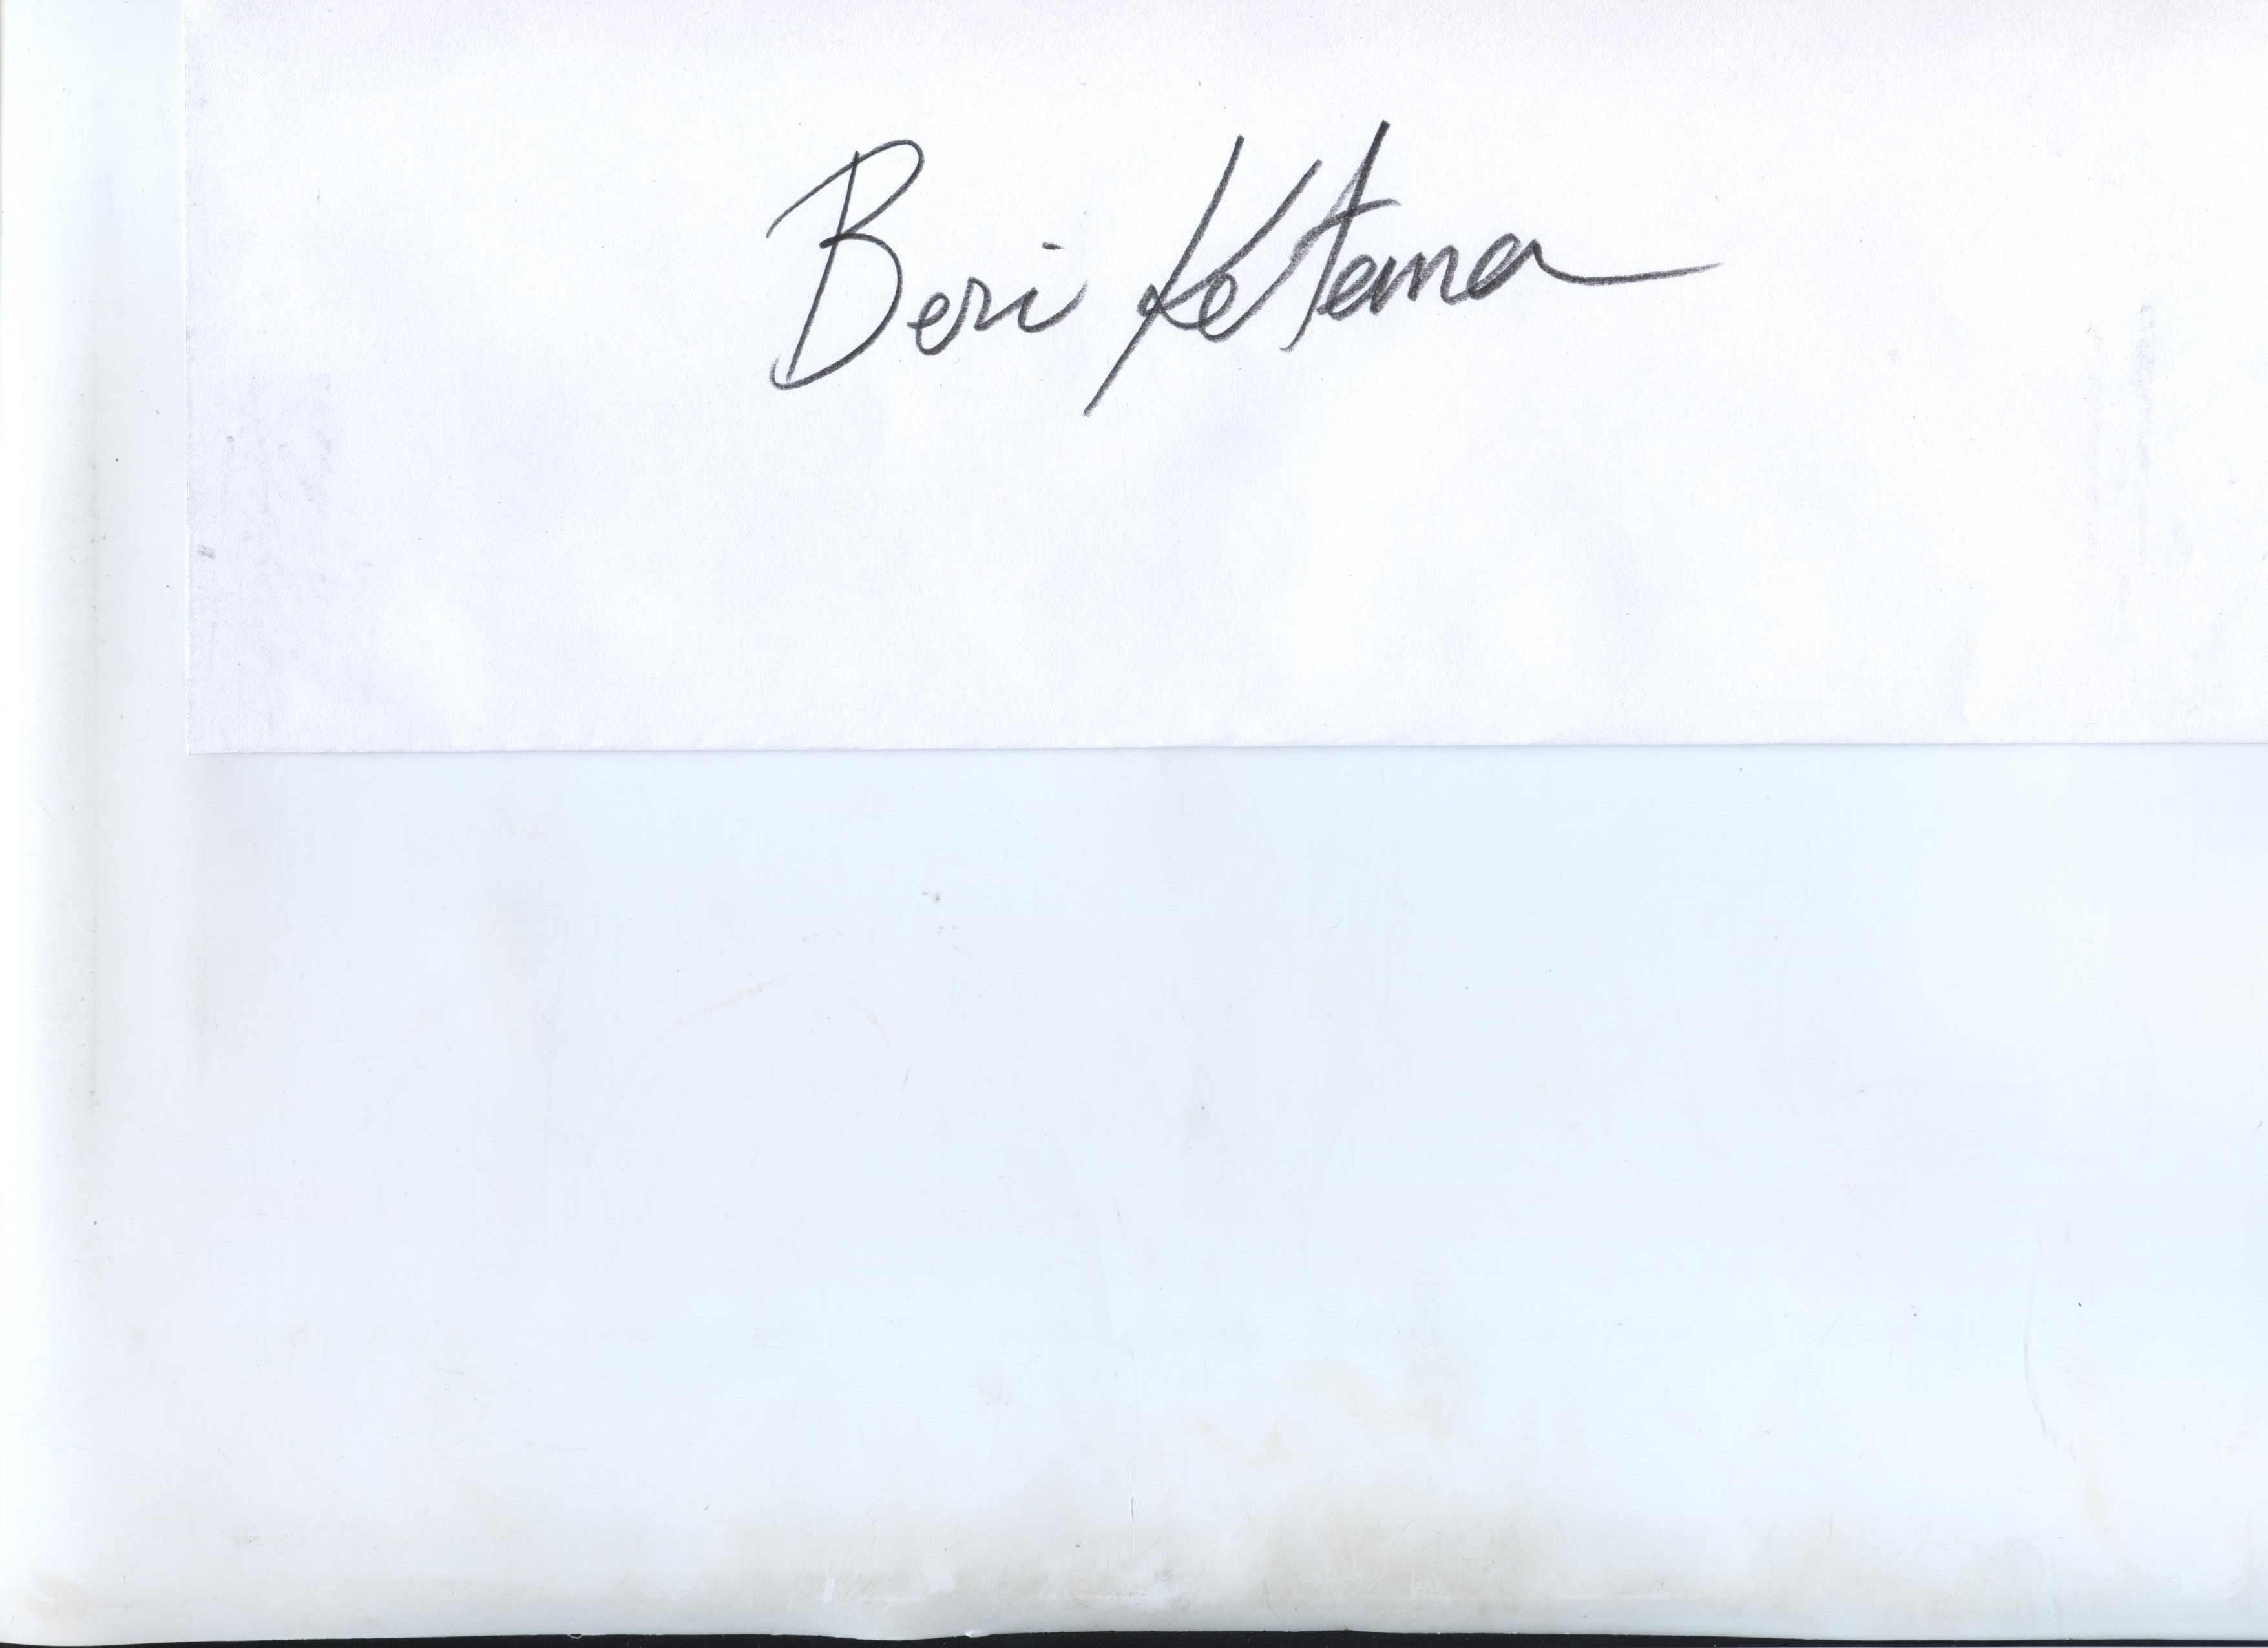 Beri Ketema's Signature